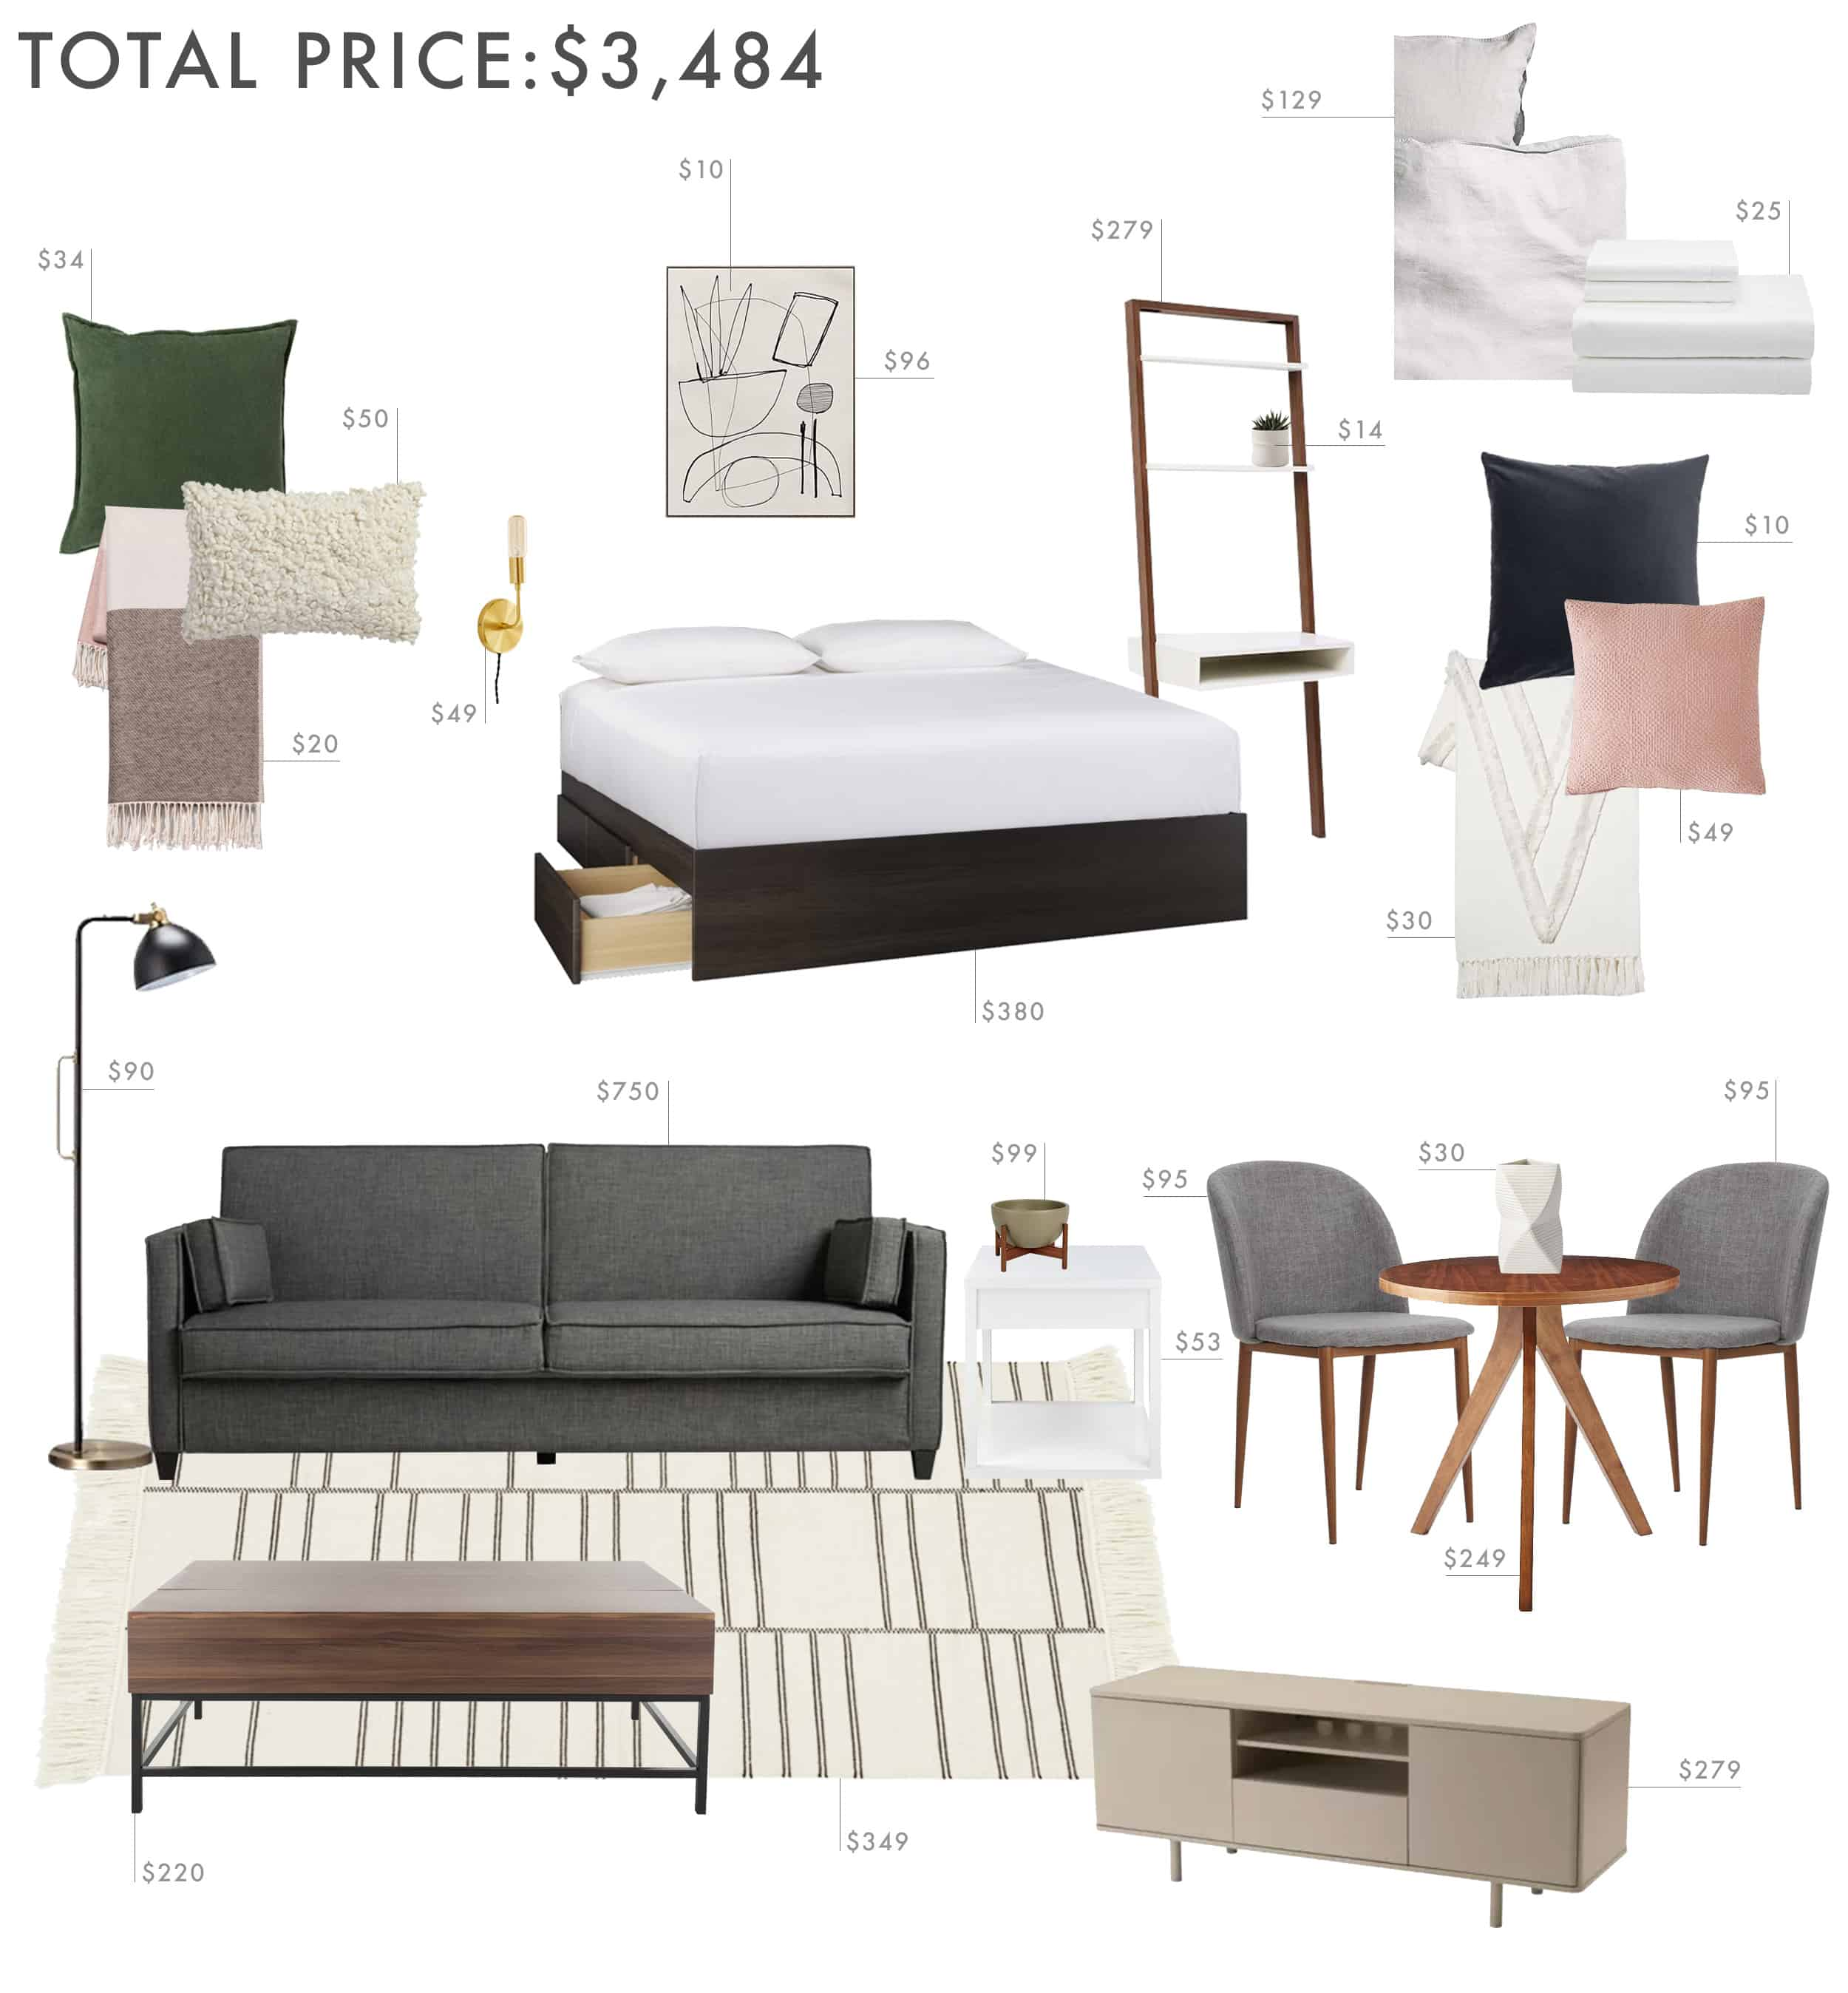 Emily Henderson Budget Room Studio Apartment 500sq Ft Under 3500k 2